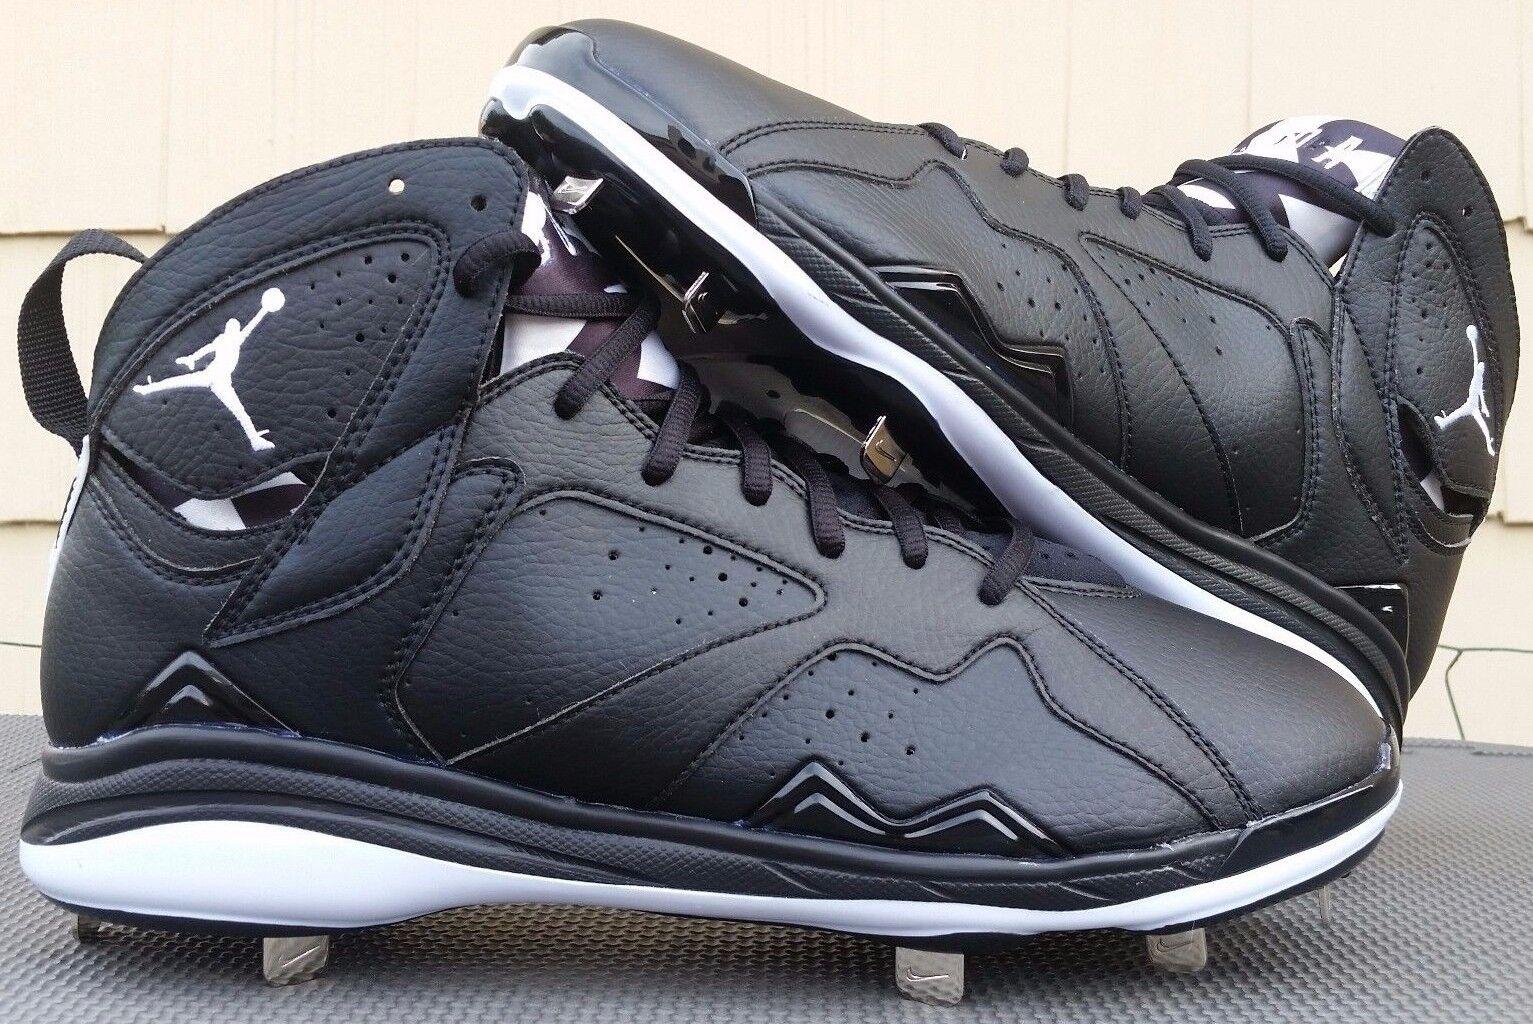 2014 Air Jordan VII 7 Metal baseball baseball baseball cleats men sz 12 schwarz Weiß 684943-010 NEW f445e2